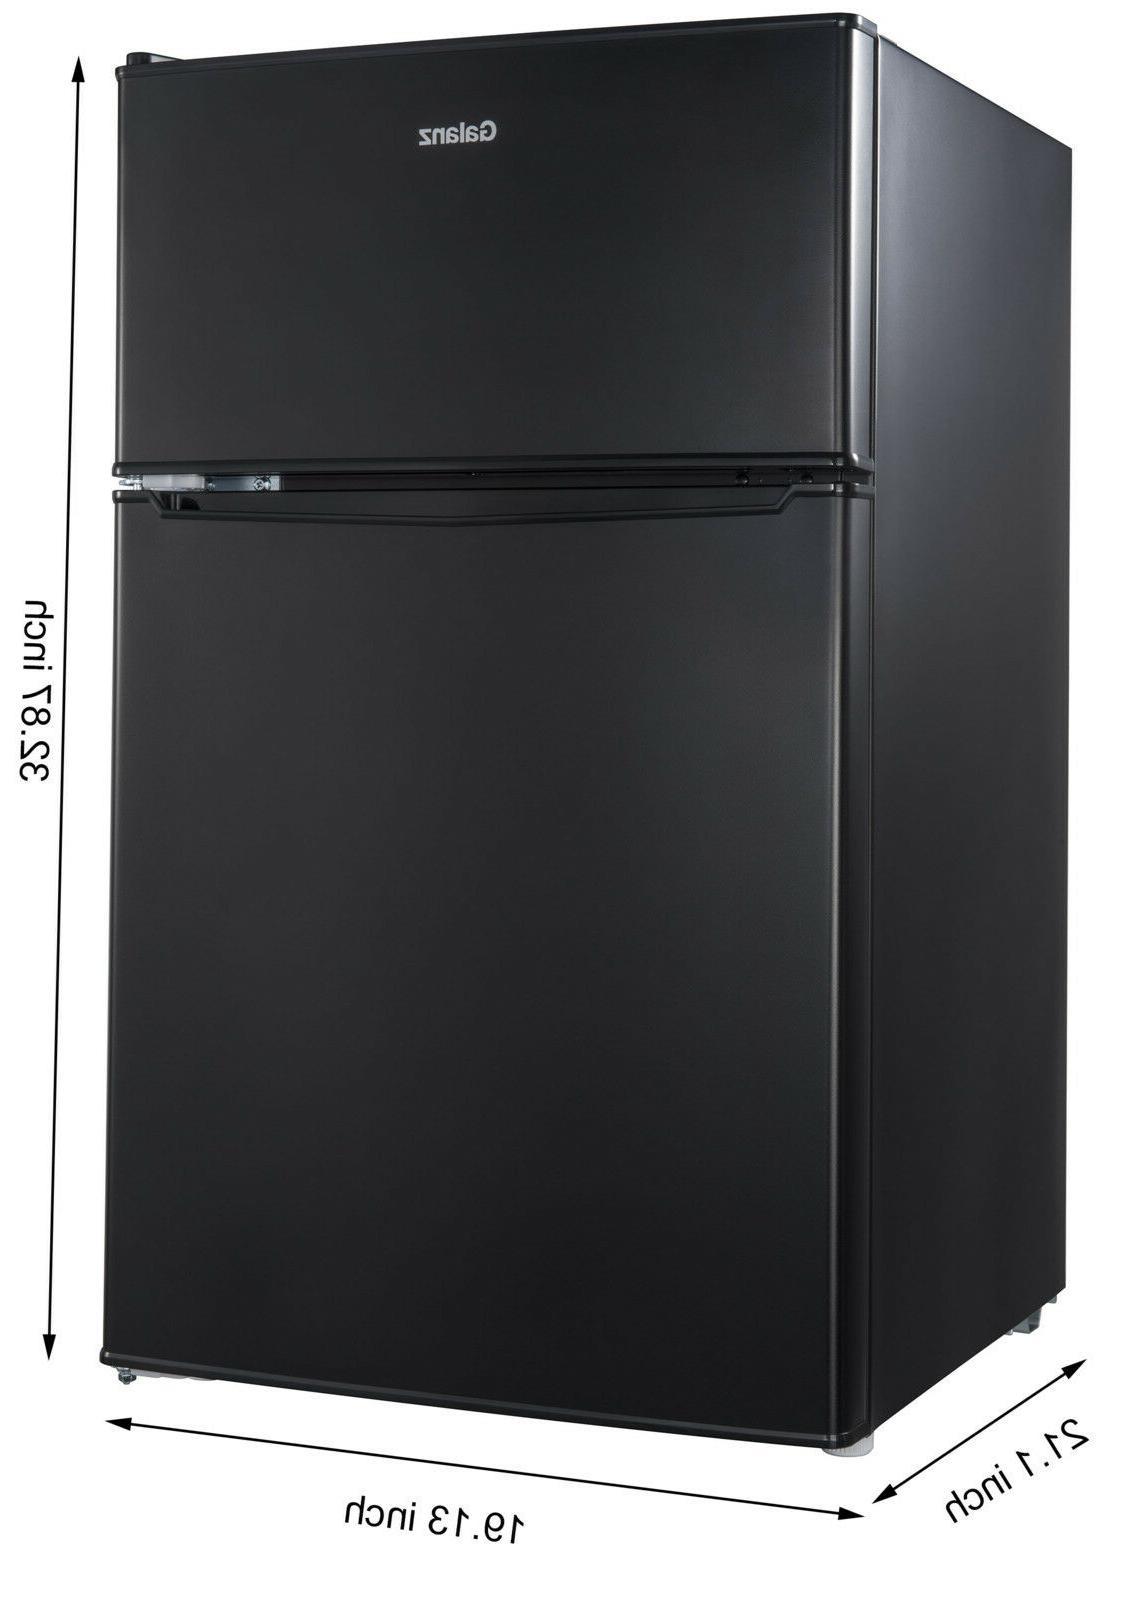 Galanz 3.1 cu ft Compact Refrigerator, Black